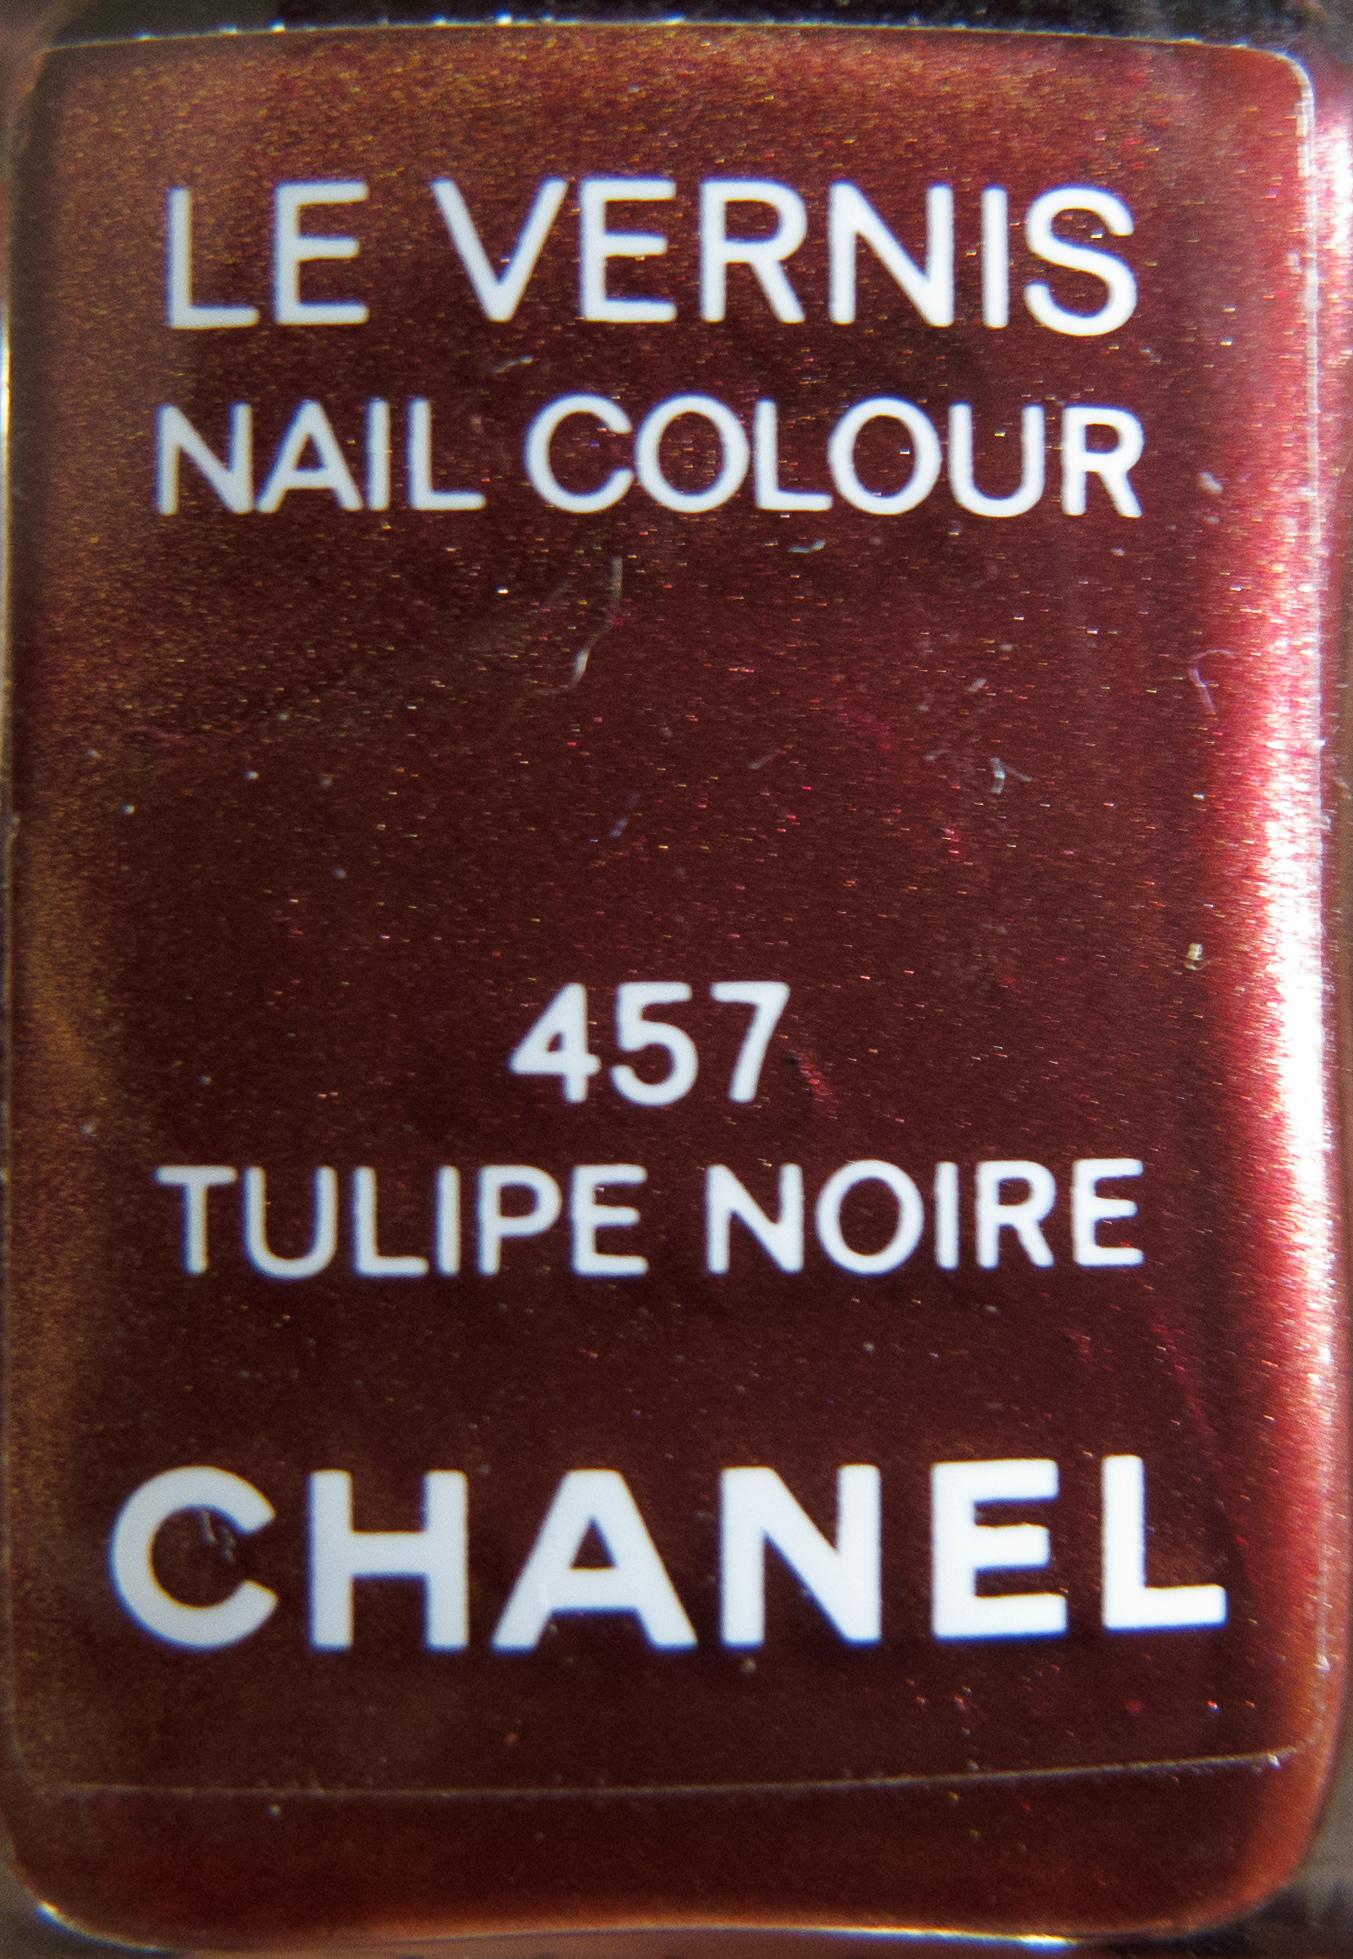 Chanel Tulipe Noire